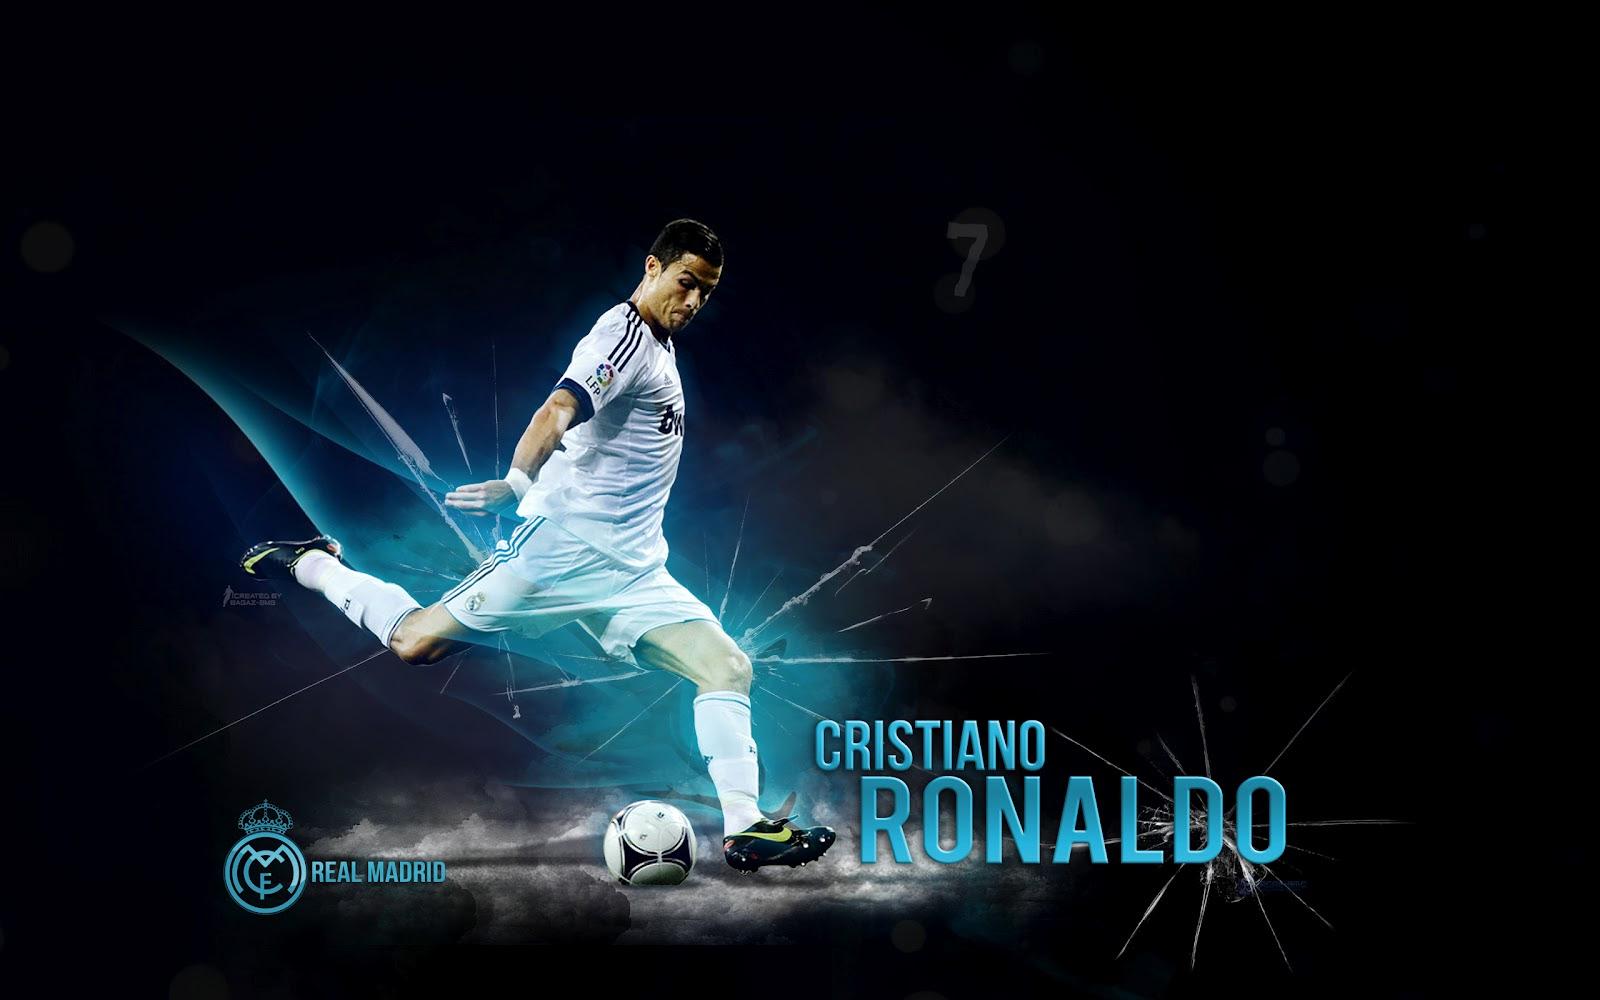 Cristiano Ronaldo Keep Calm And Play Wallpaper Hd Like Wallpapers